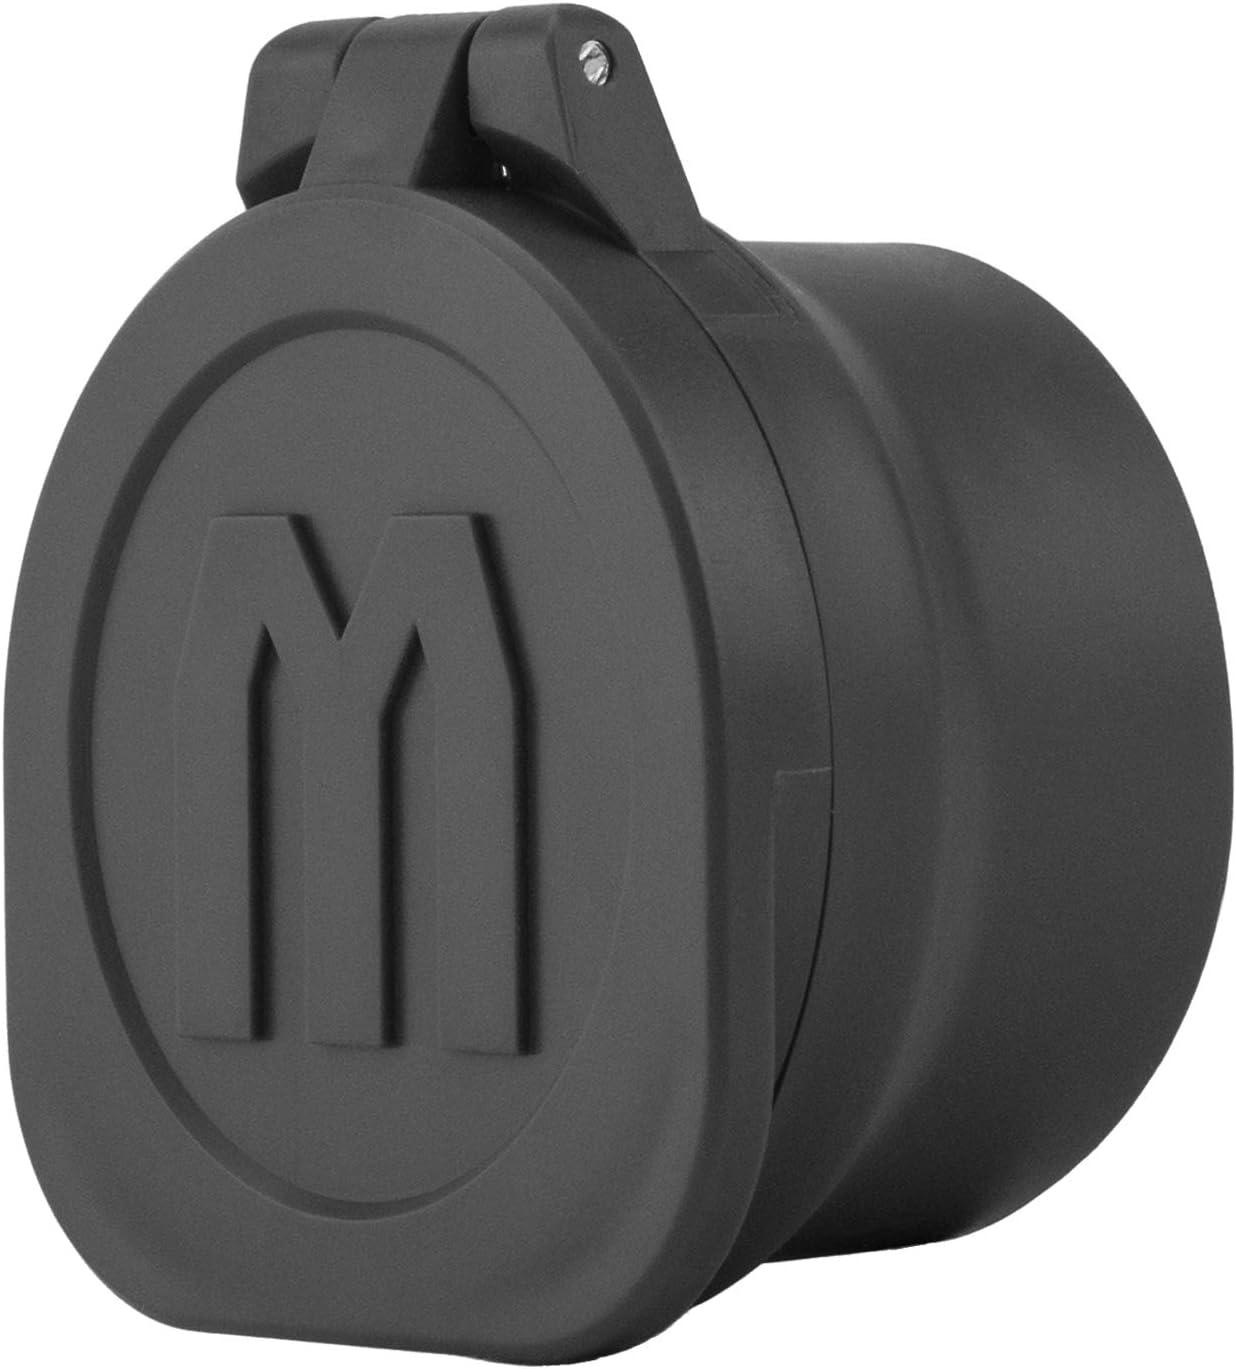 5. Monstrum Rubberized Flip-Up Rifle Scope Lens Covers